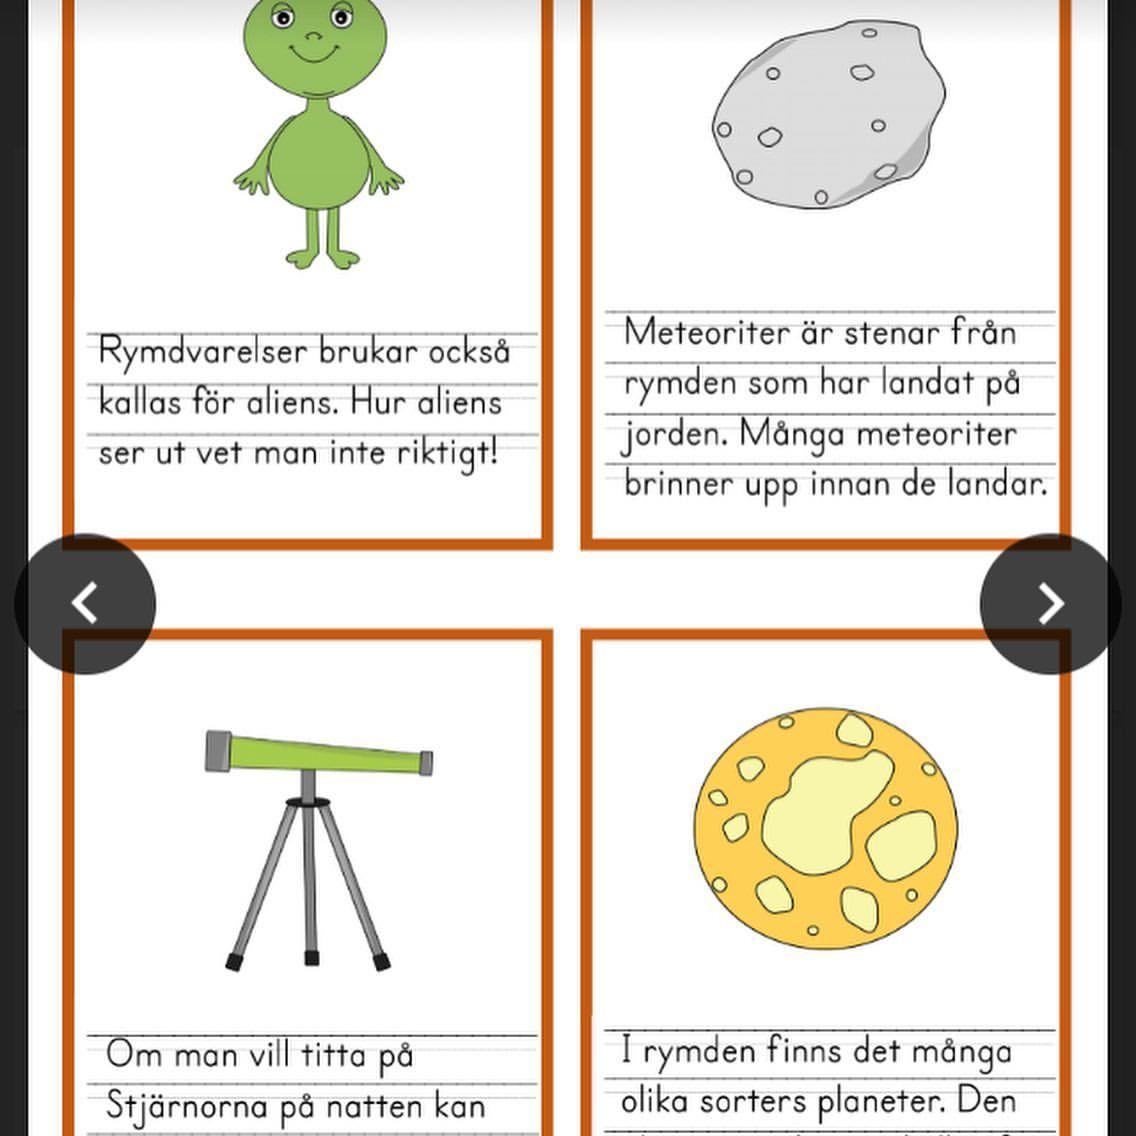 Posts tagged as #svenskundervisning | Picdeer | Undervisning